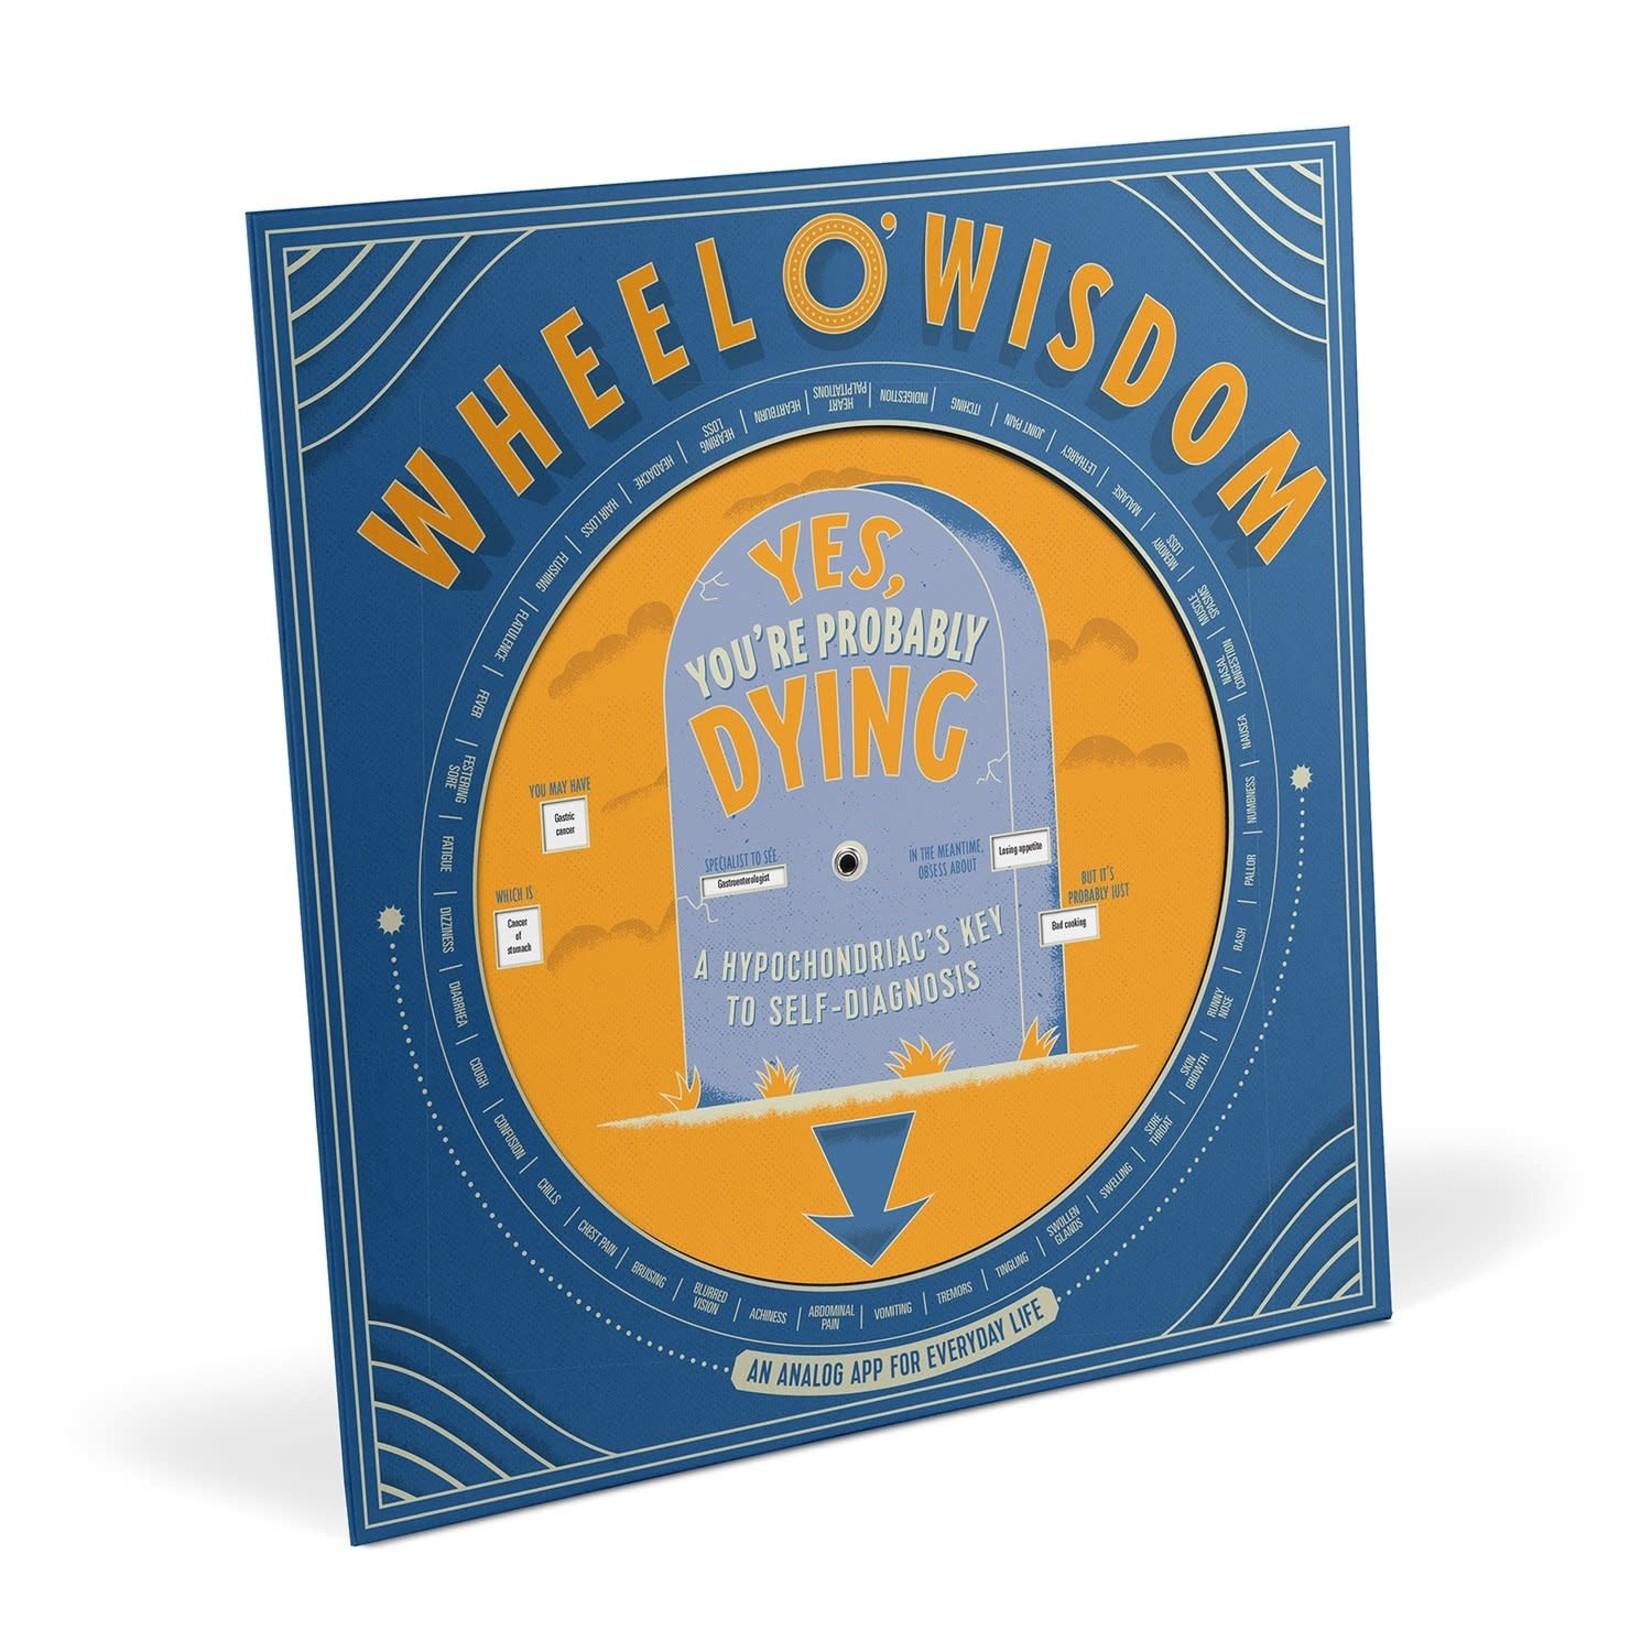 Wheel O' Wisdom